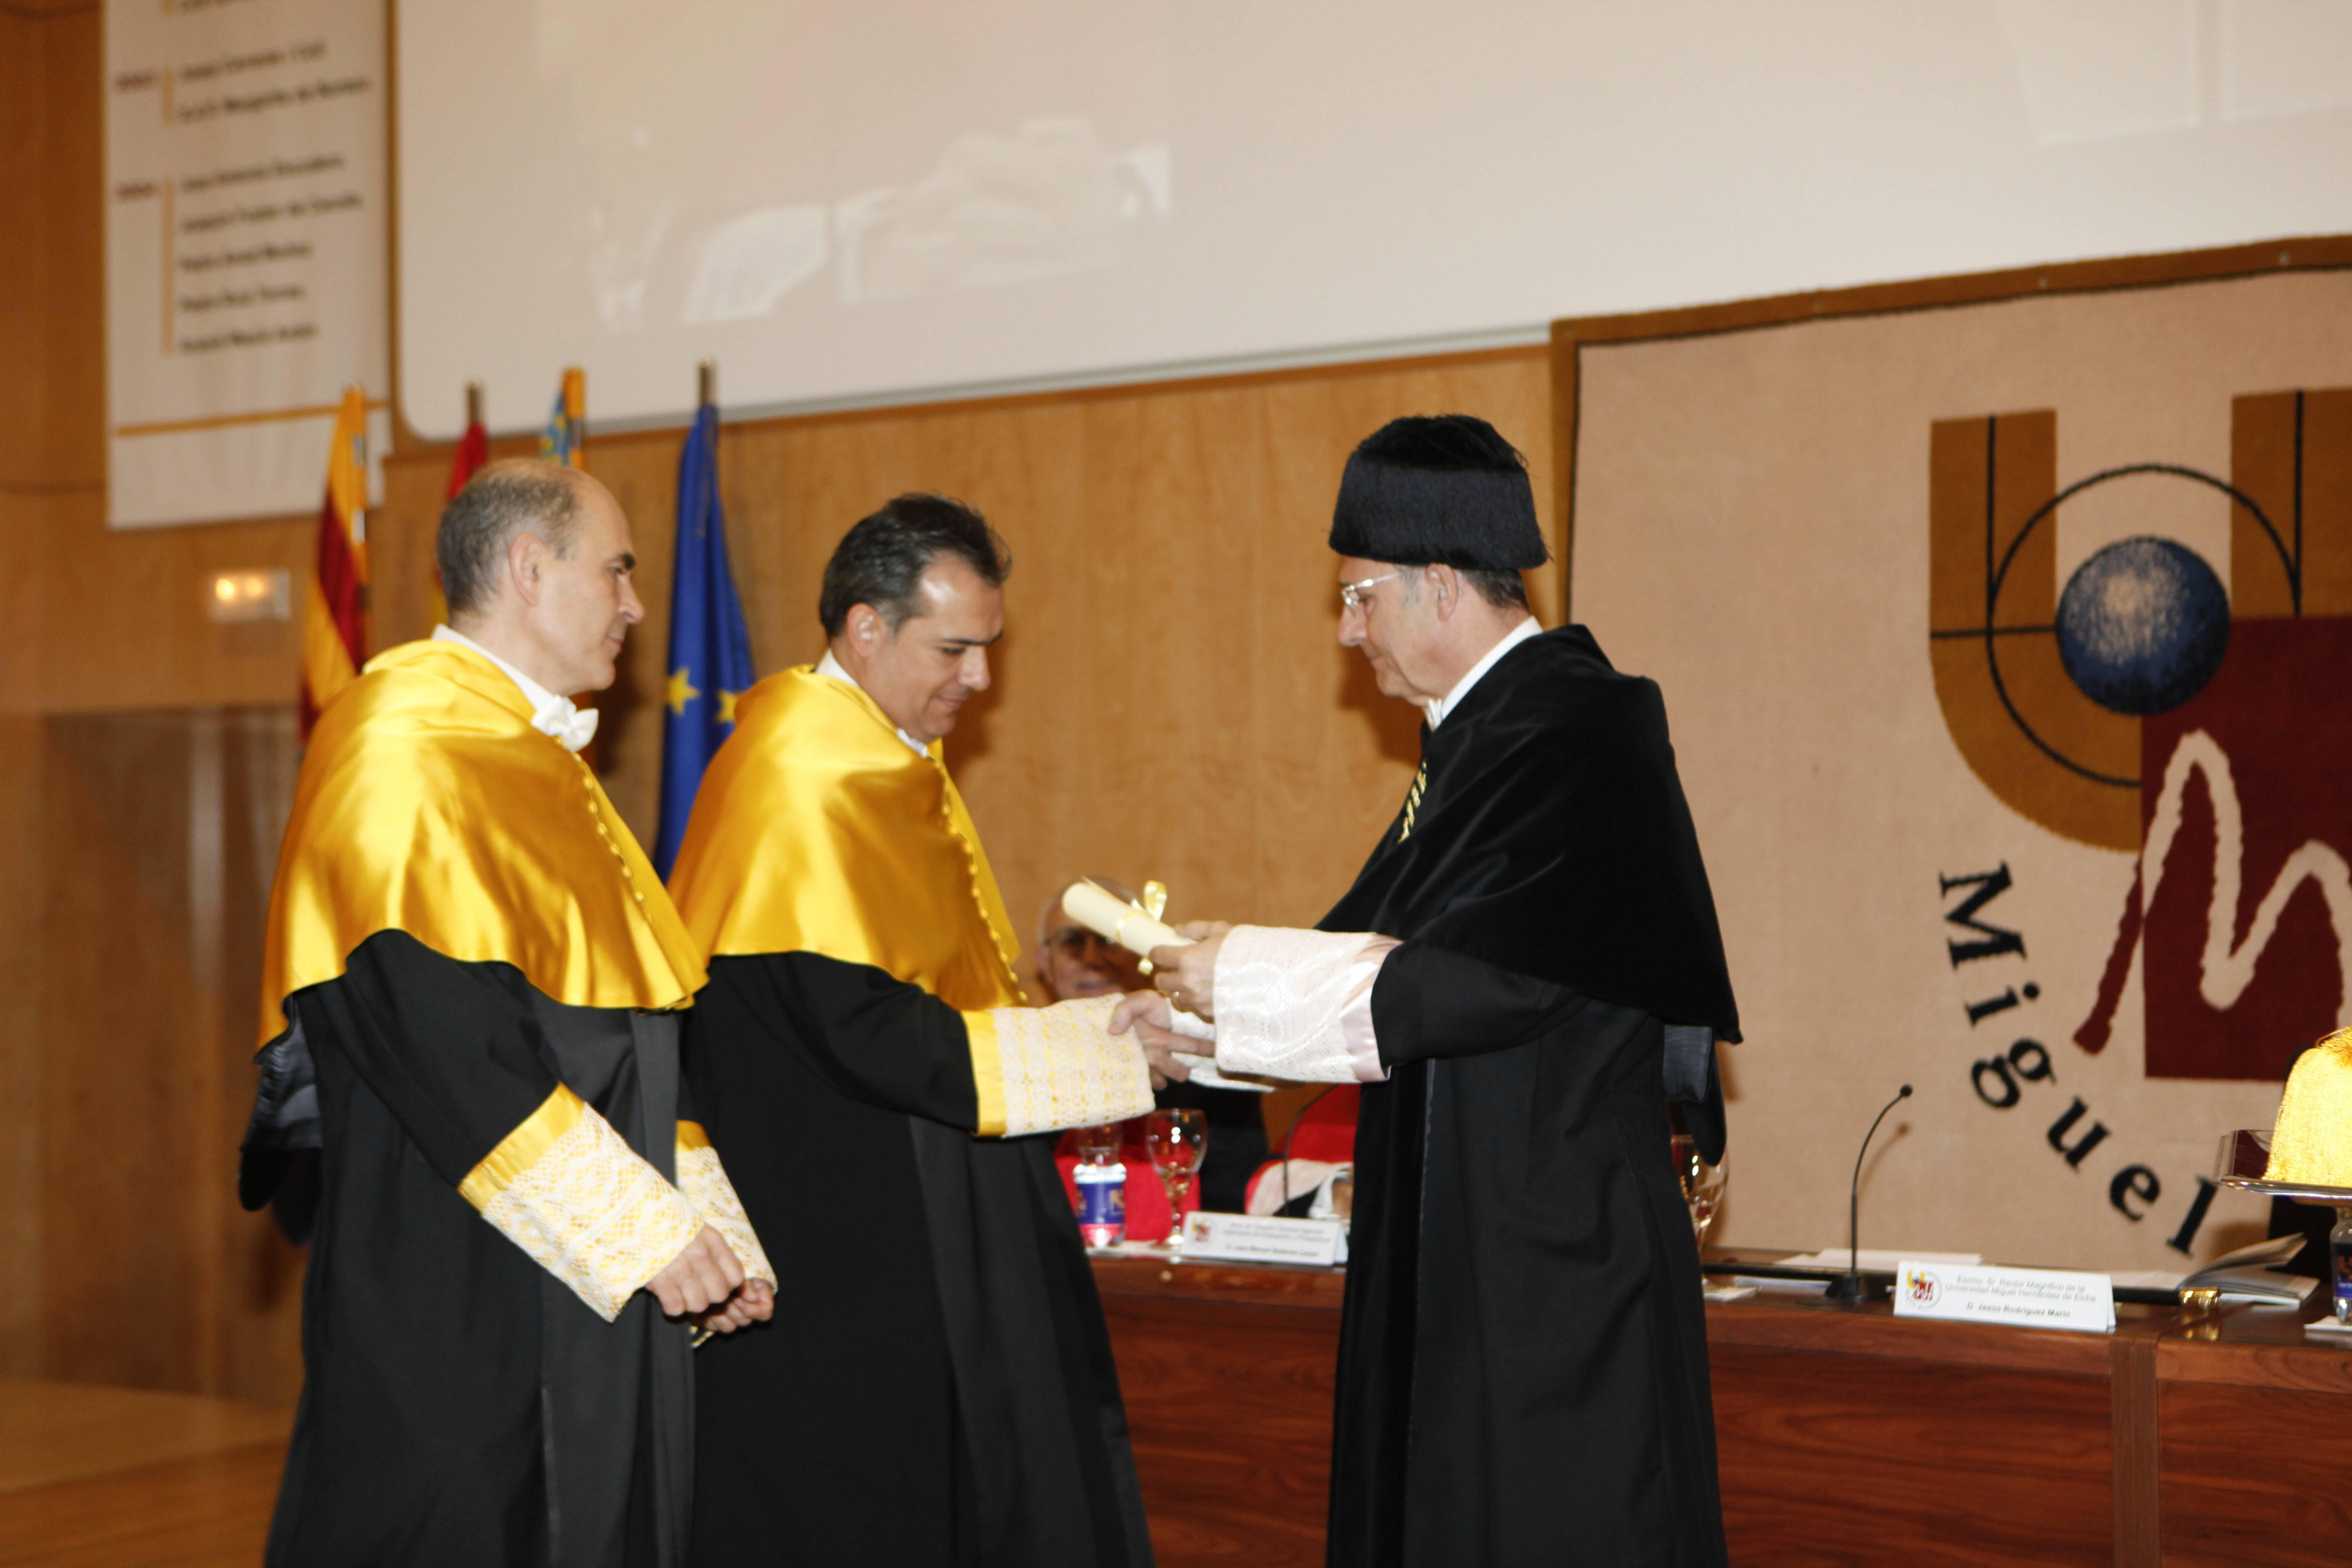 doctor-honoris-causa-luis-gamir_mg_1106.jpg